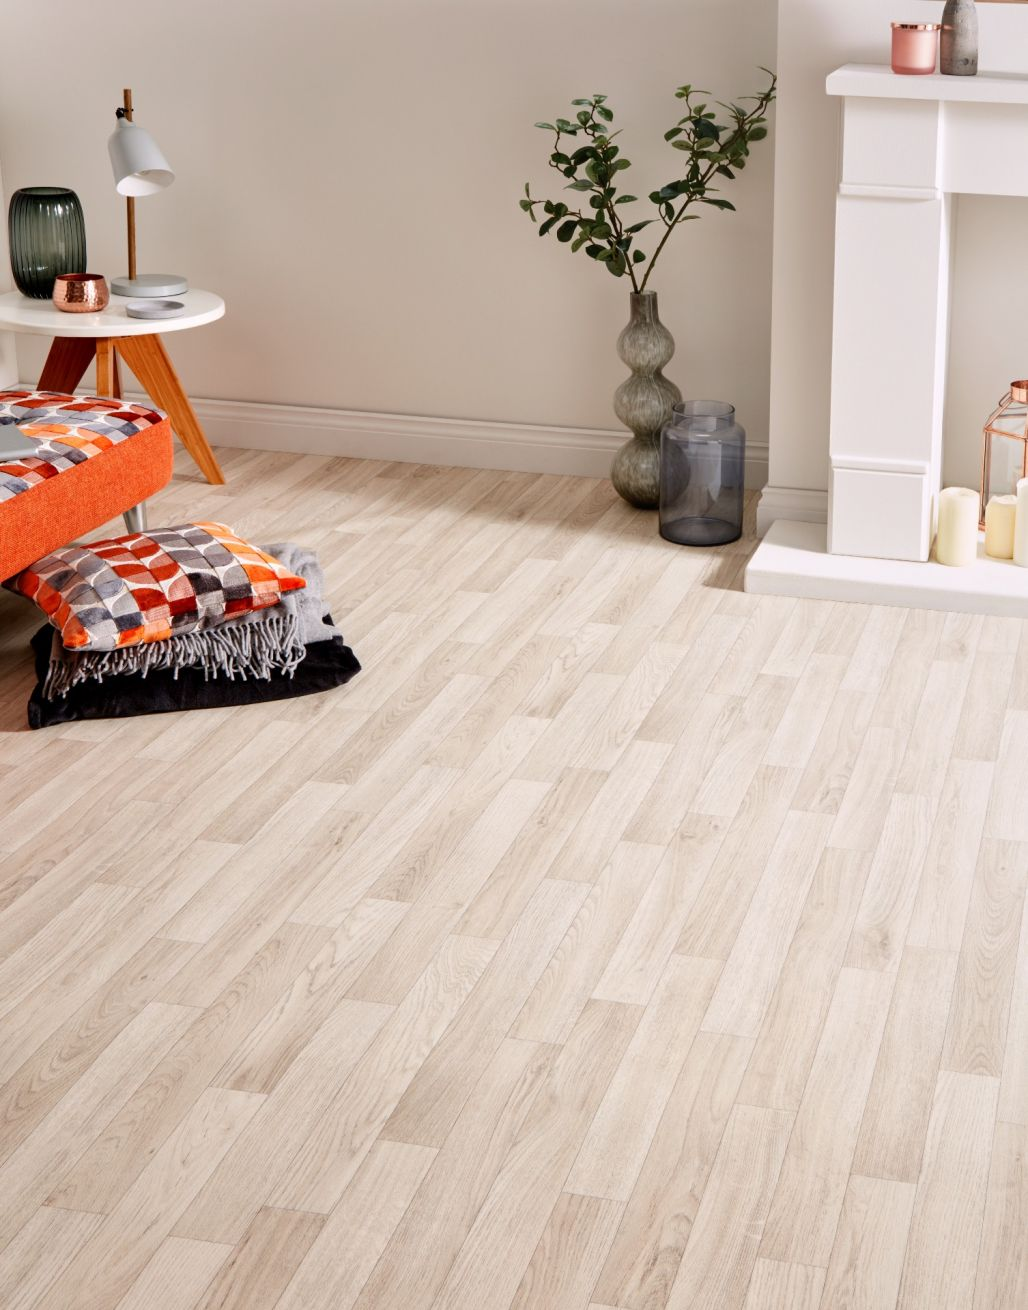 Colorado Columbia Oak Flooring, Columbia Oak Laminate Flooring